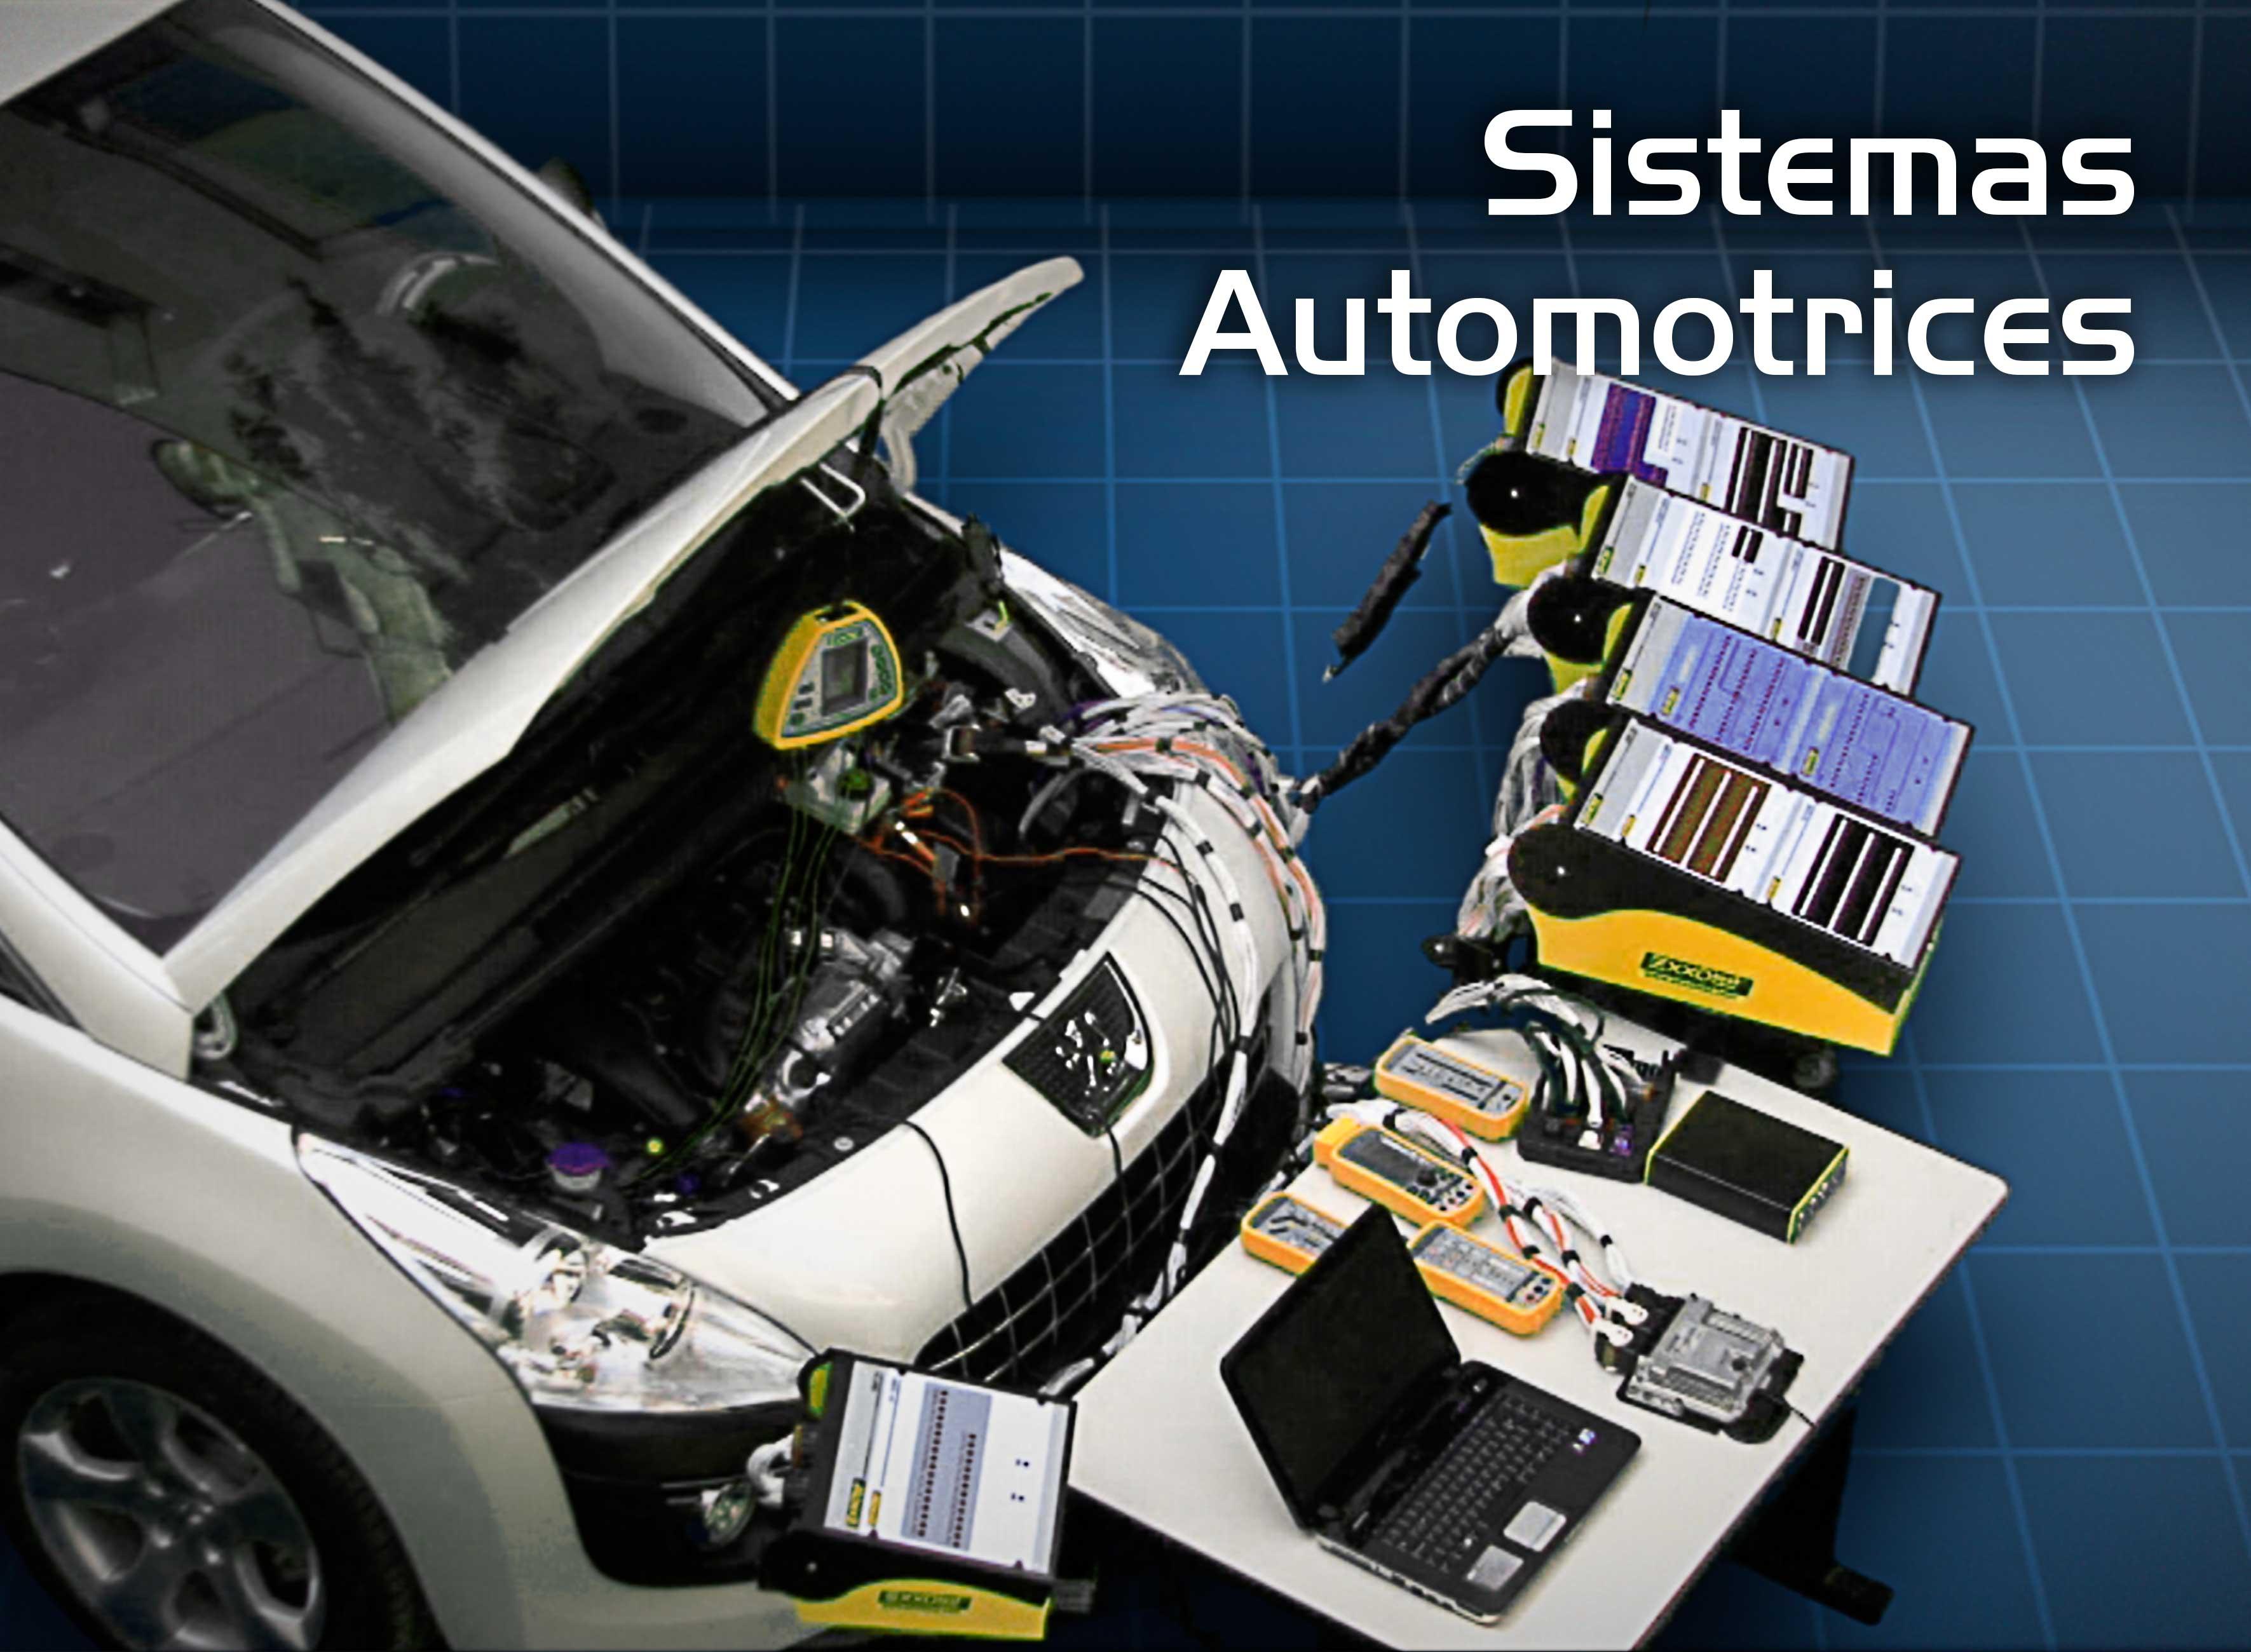 sistemas-automotrises